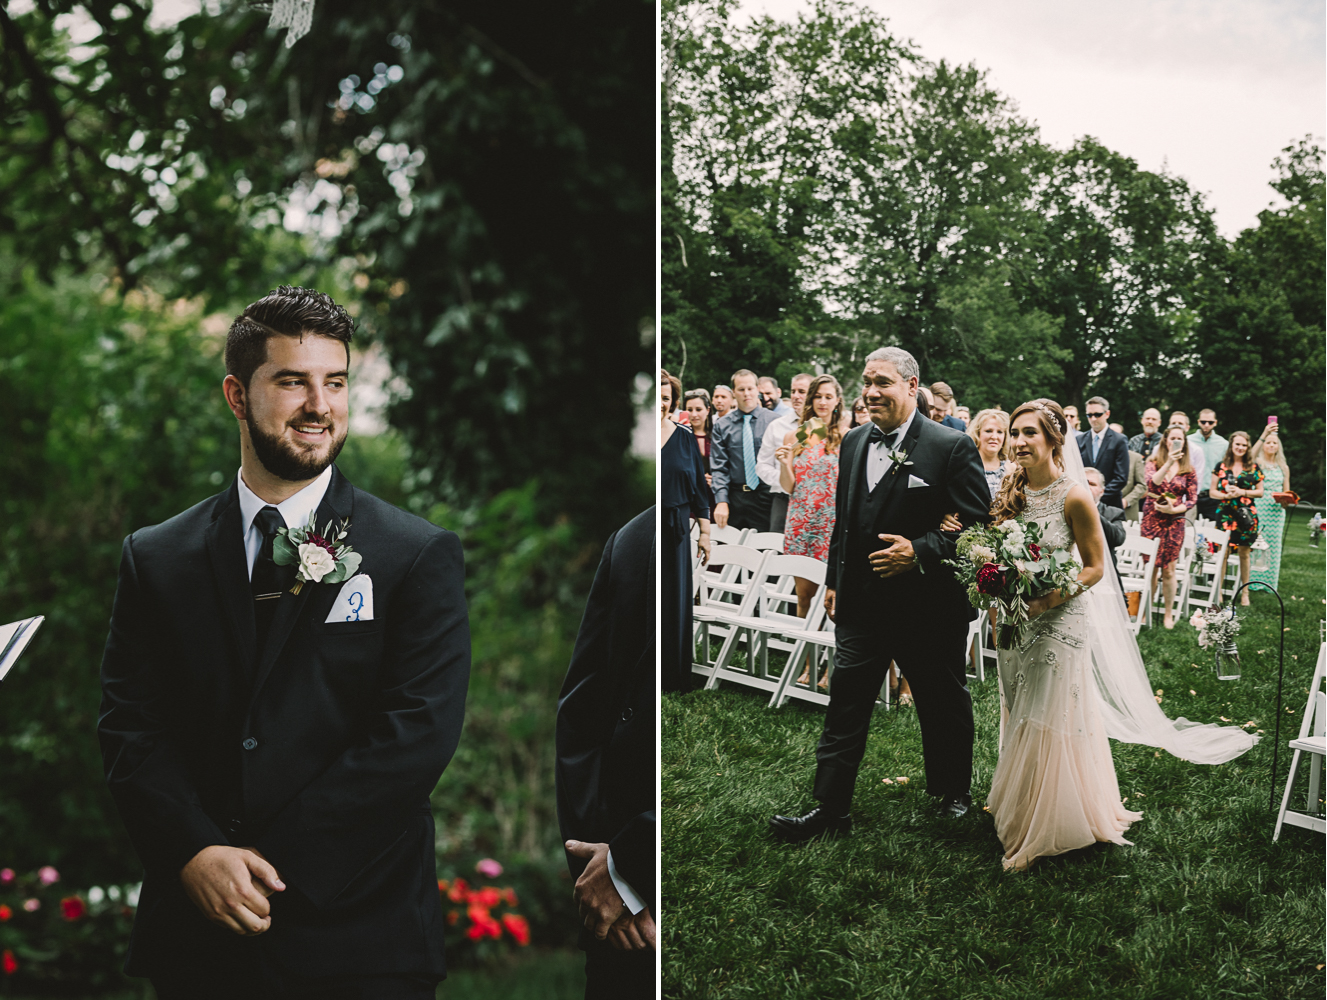 Barbara O Photography antrim 1844 wedding bridal party blush dresses6.jpg